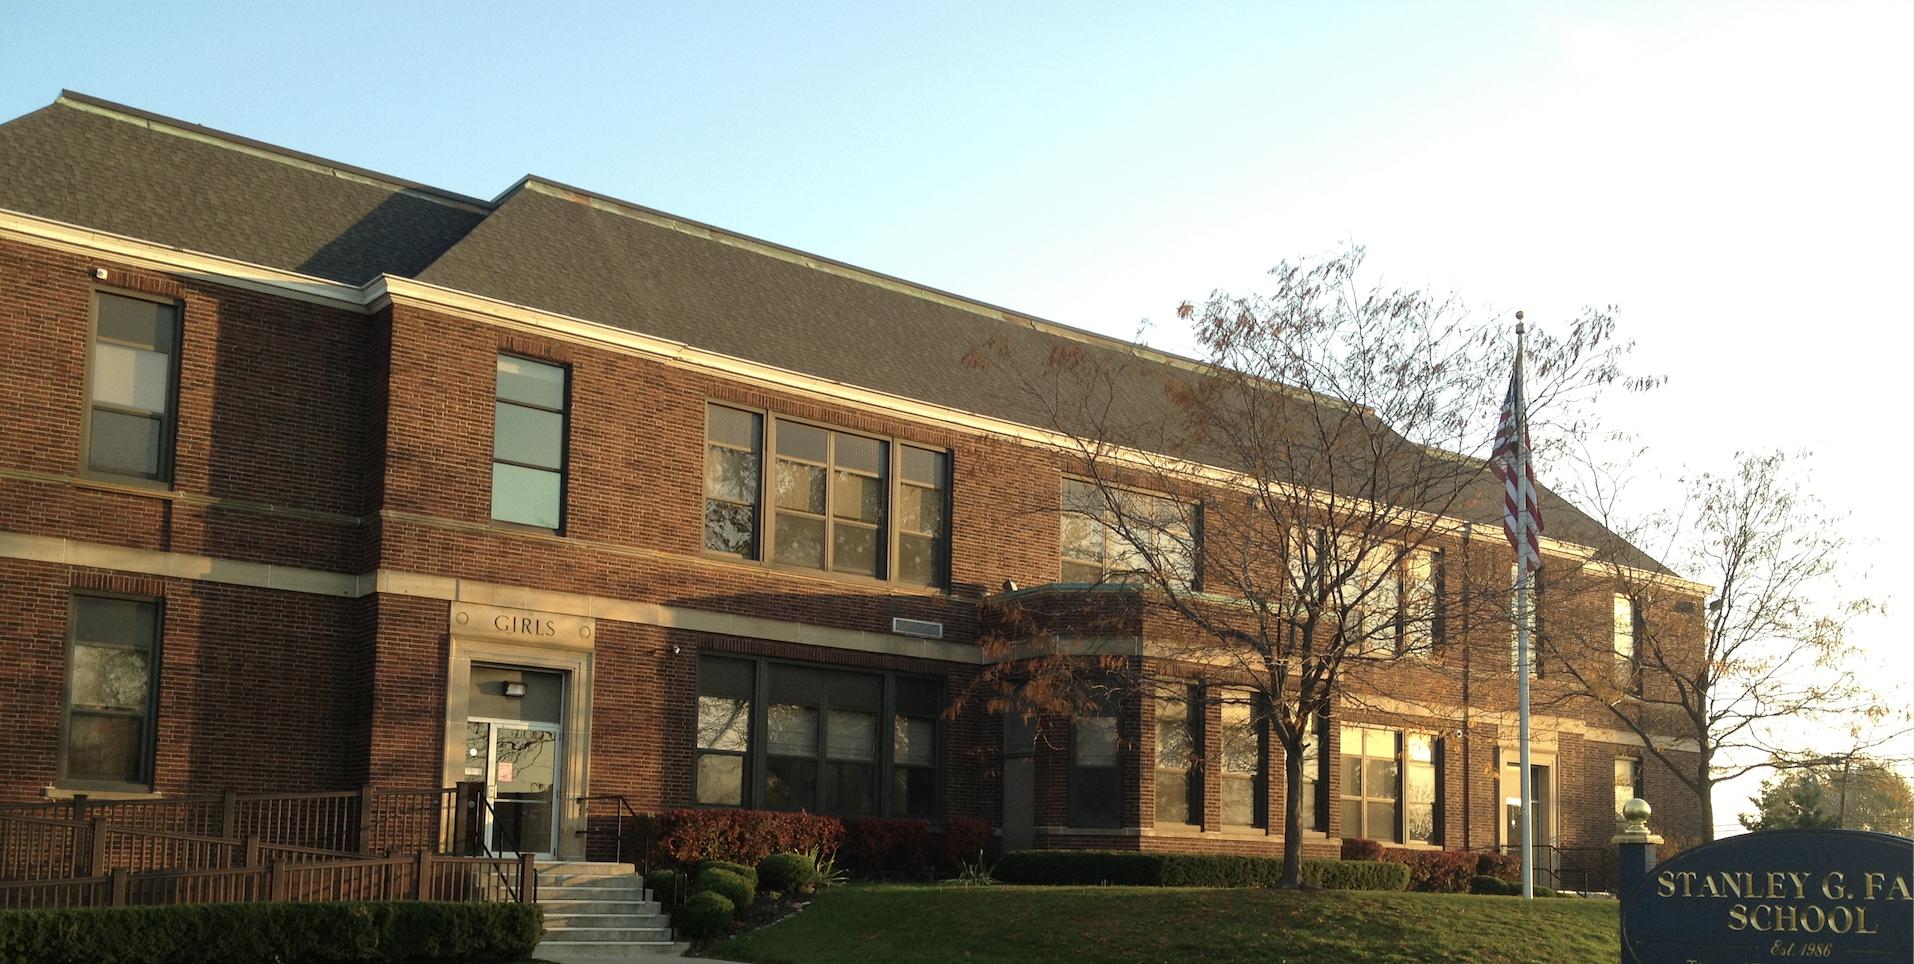 A photo of the Cambridge campus school building